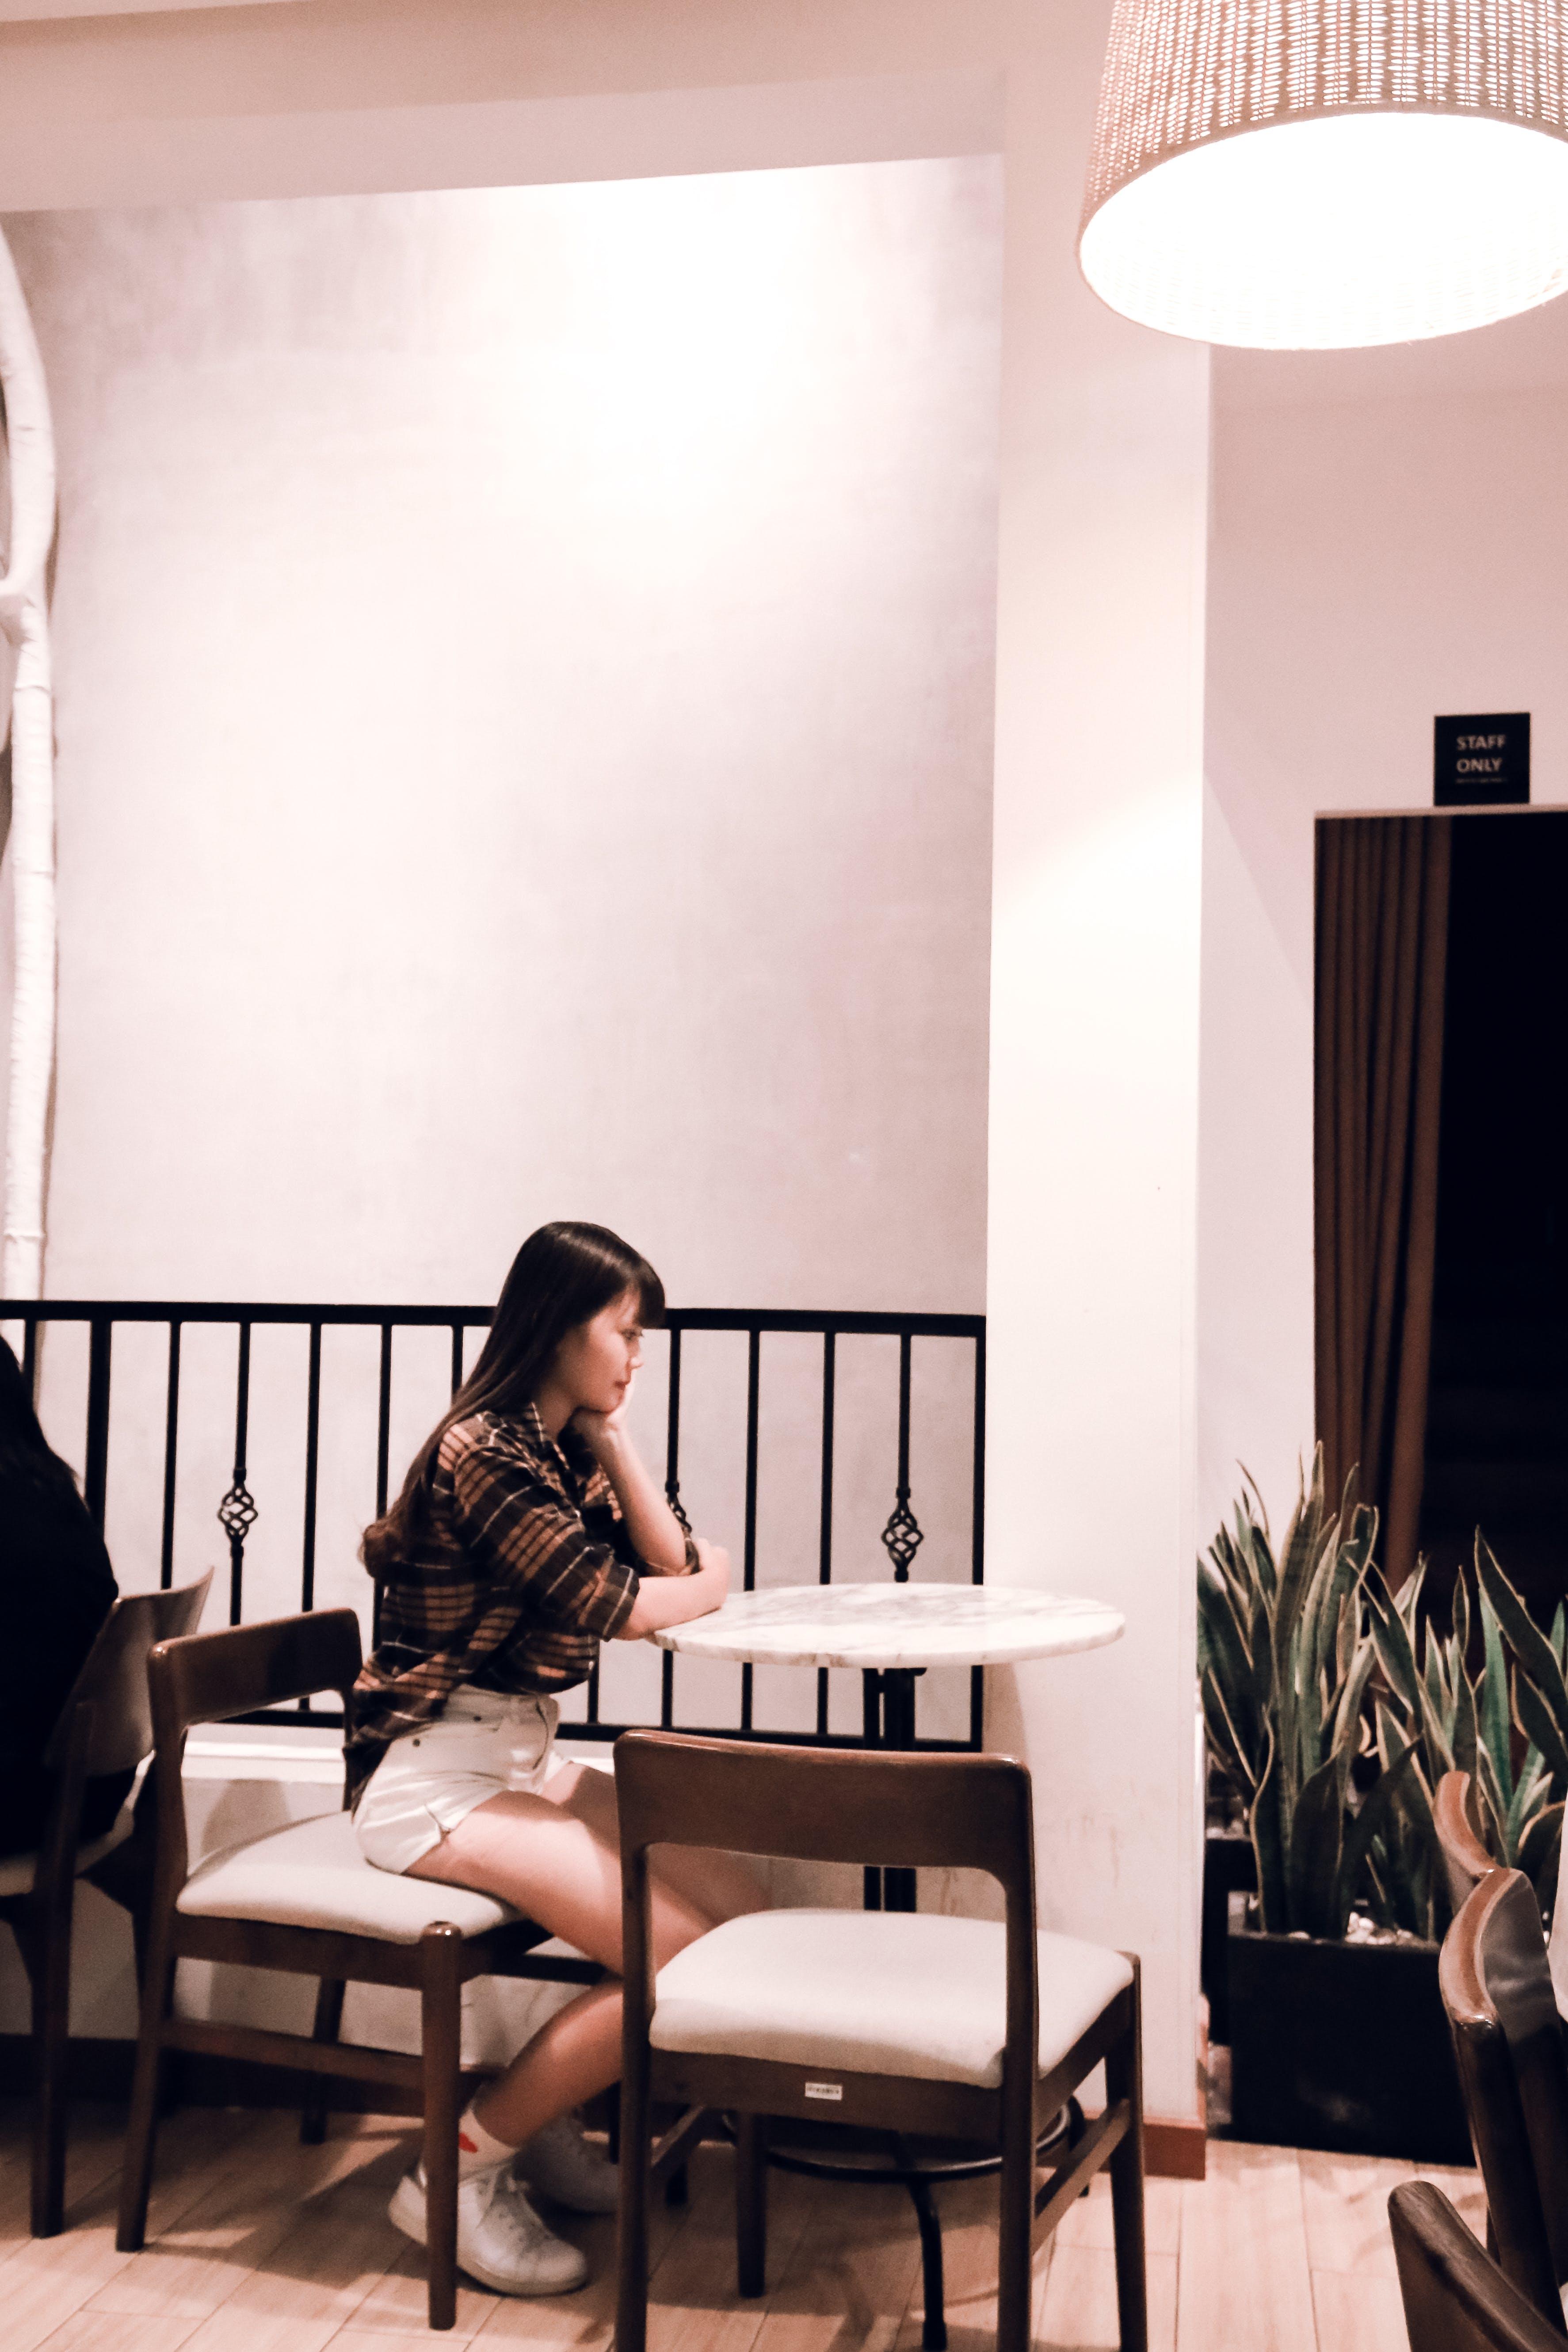 Sitting Woman Wearing White Short Shorts and Long-sleeved Shirt